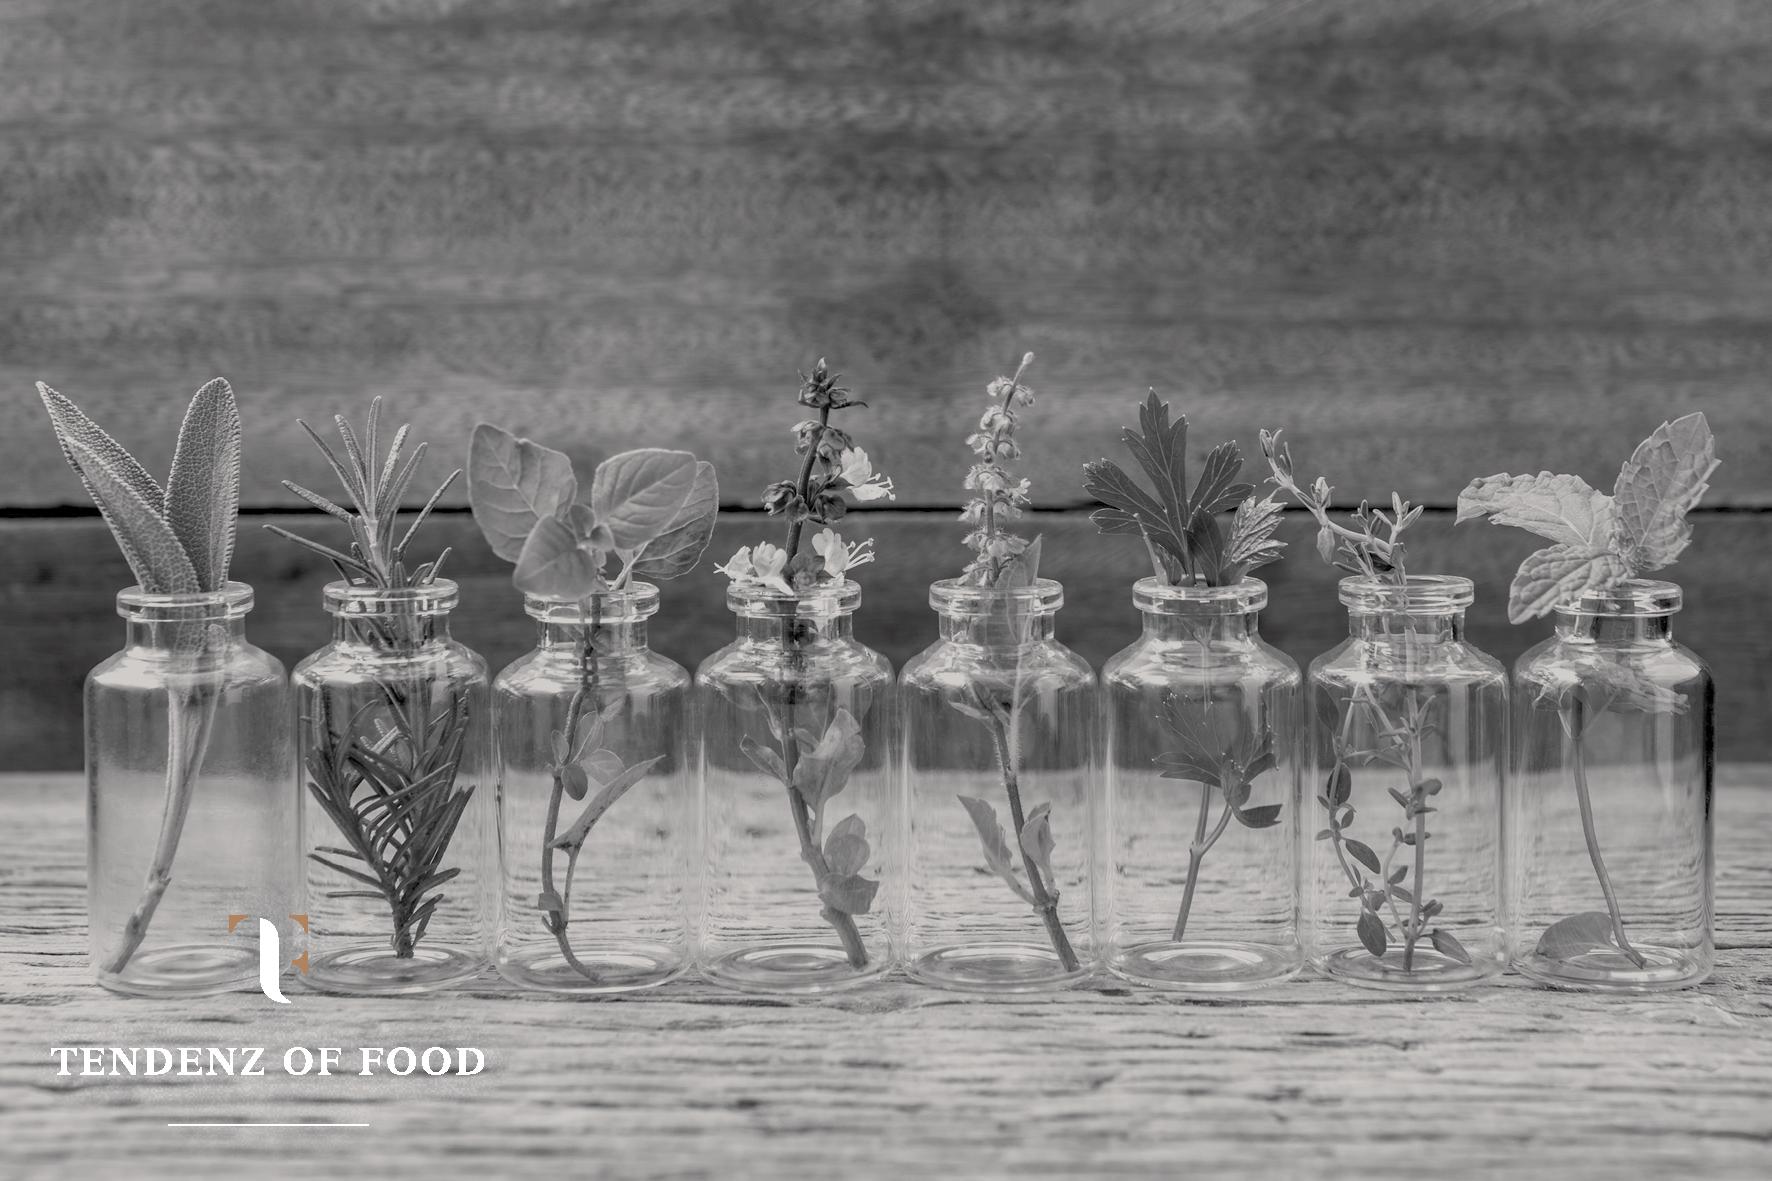 Tendenz of Food3